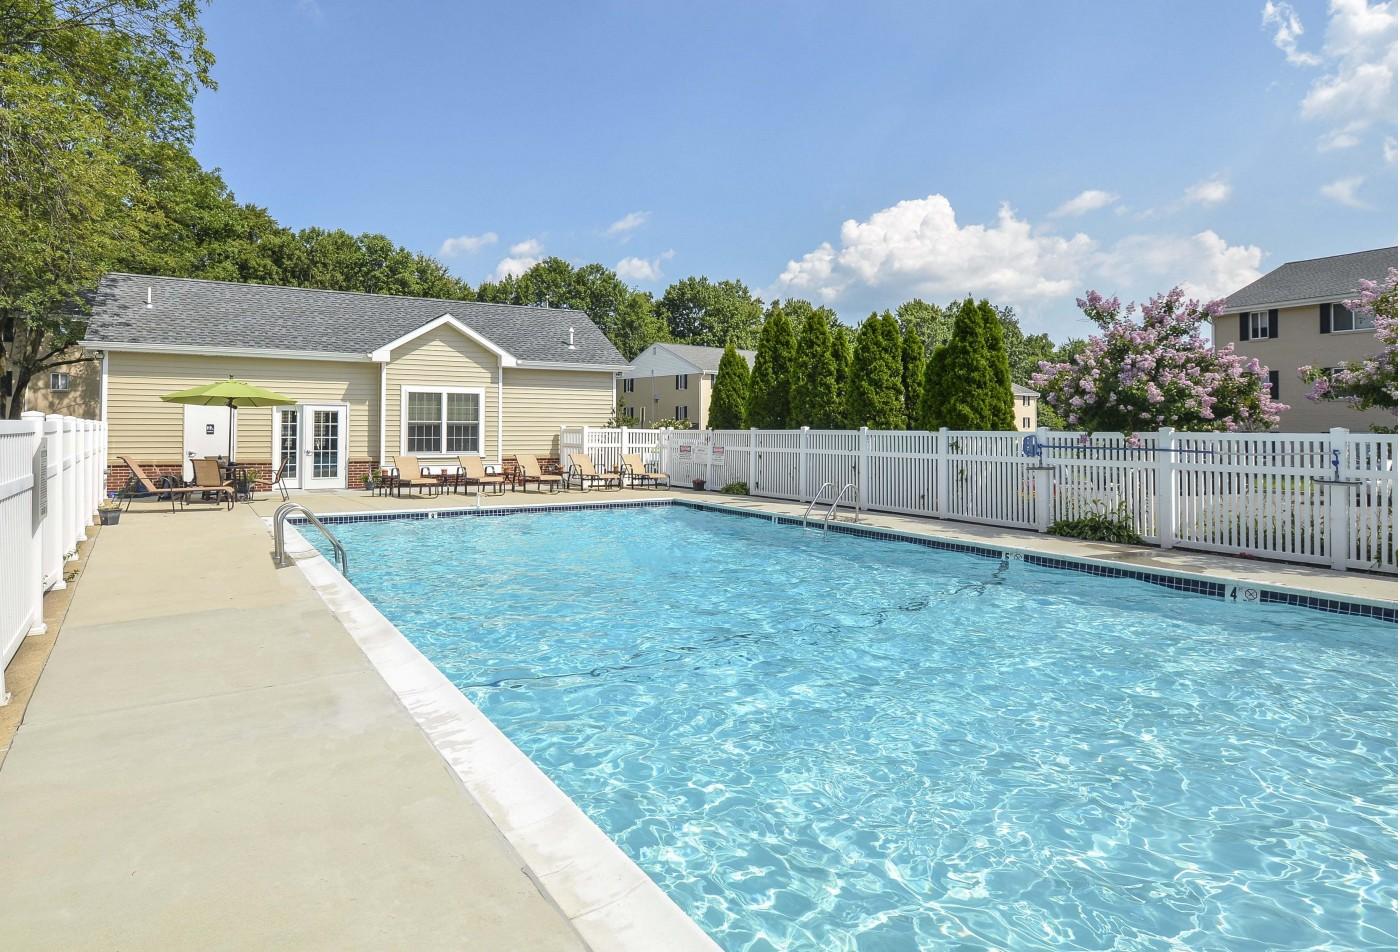 Swimming Pool | Apartment Homes in Wilmington, DE | Cedar Tree Apartments